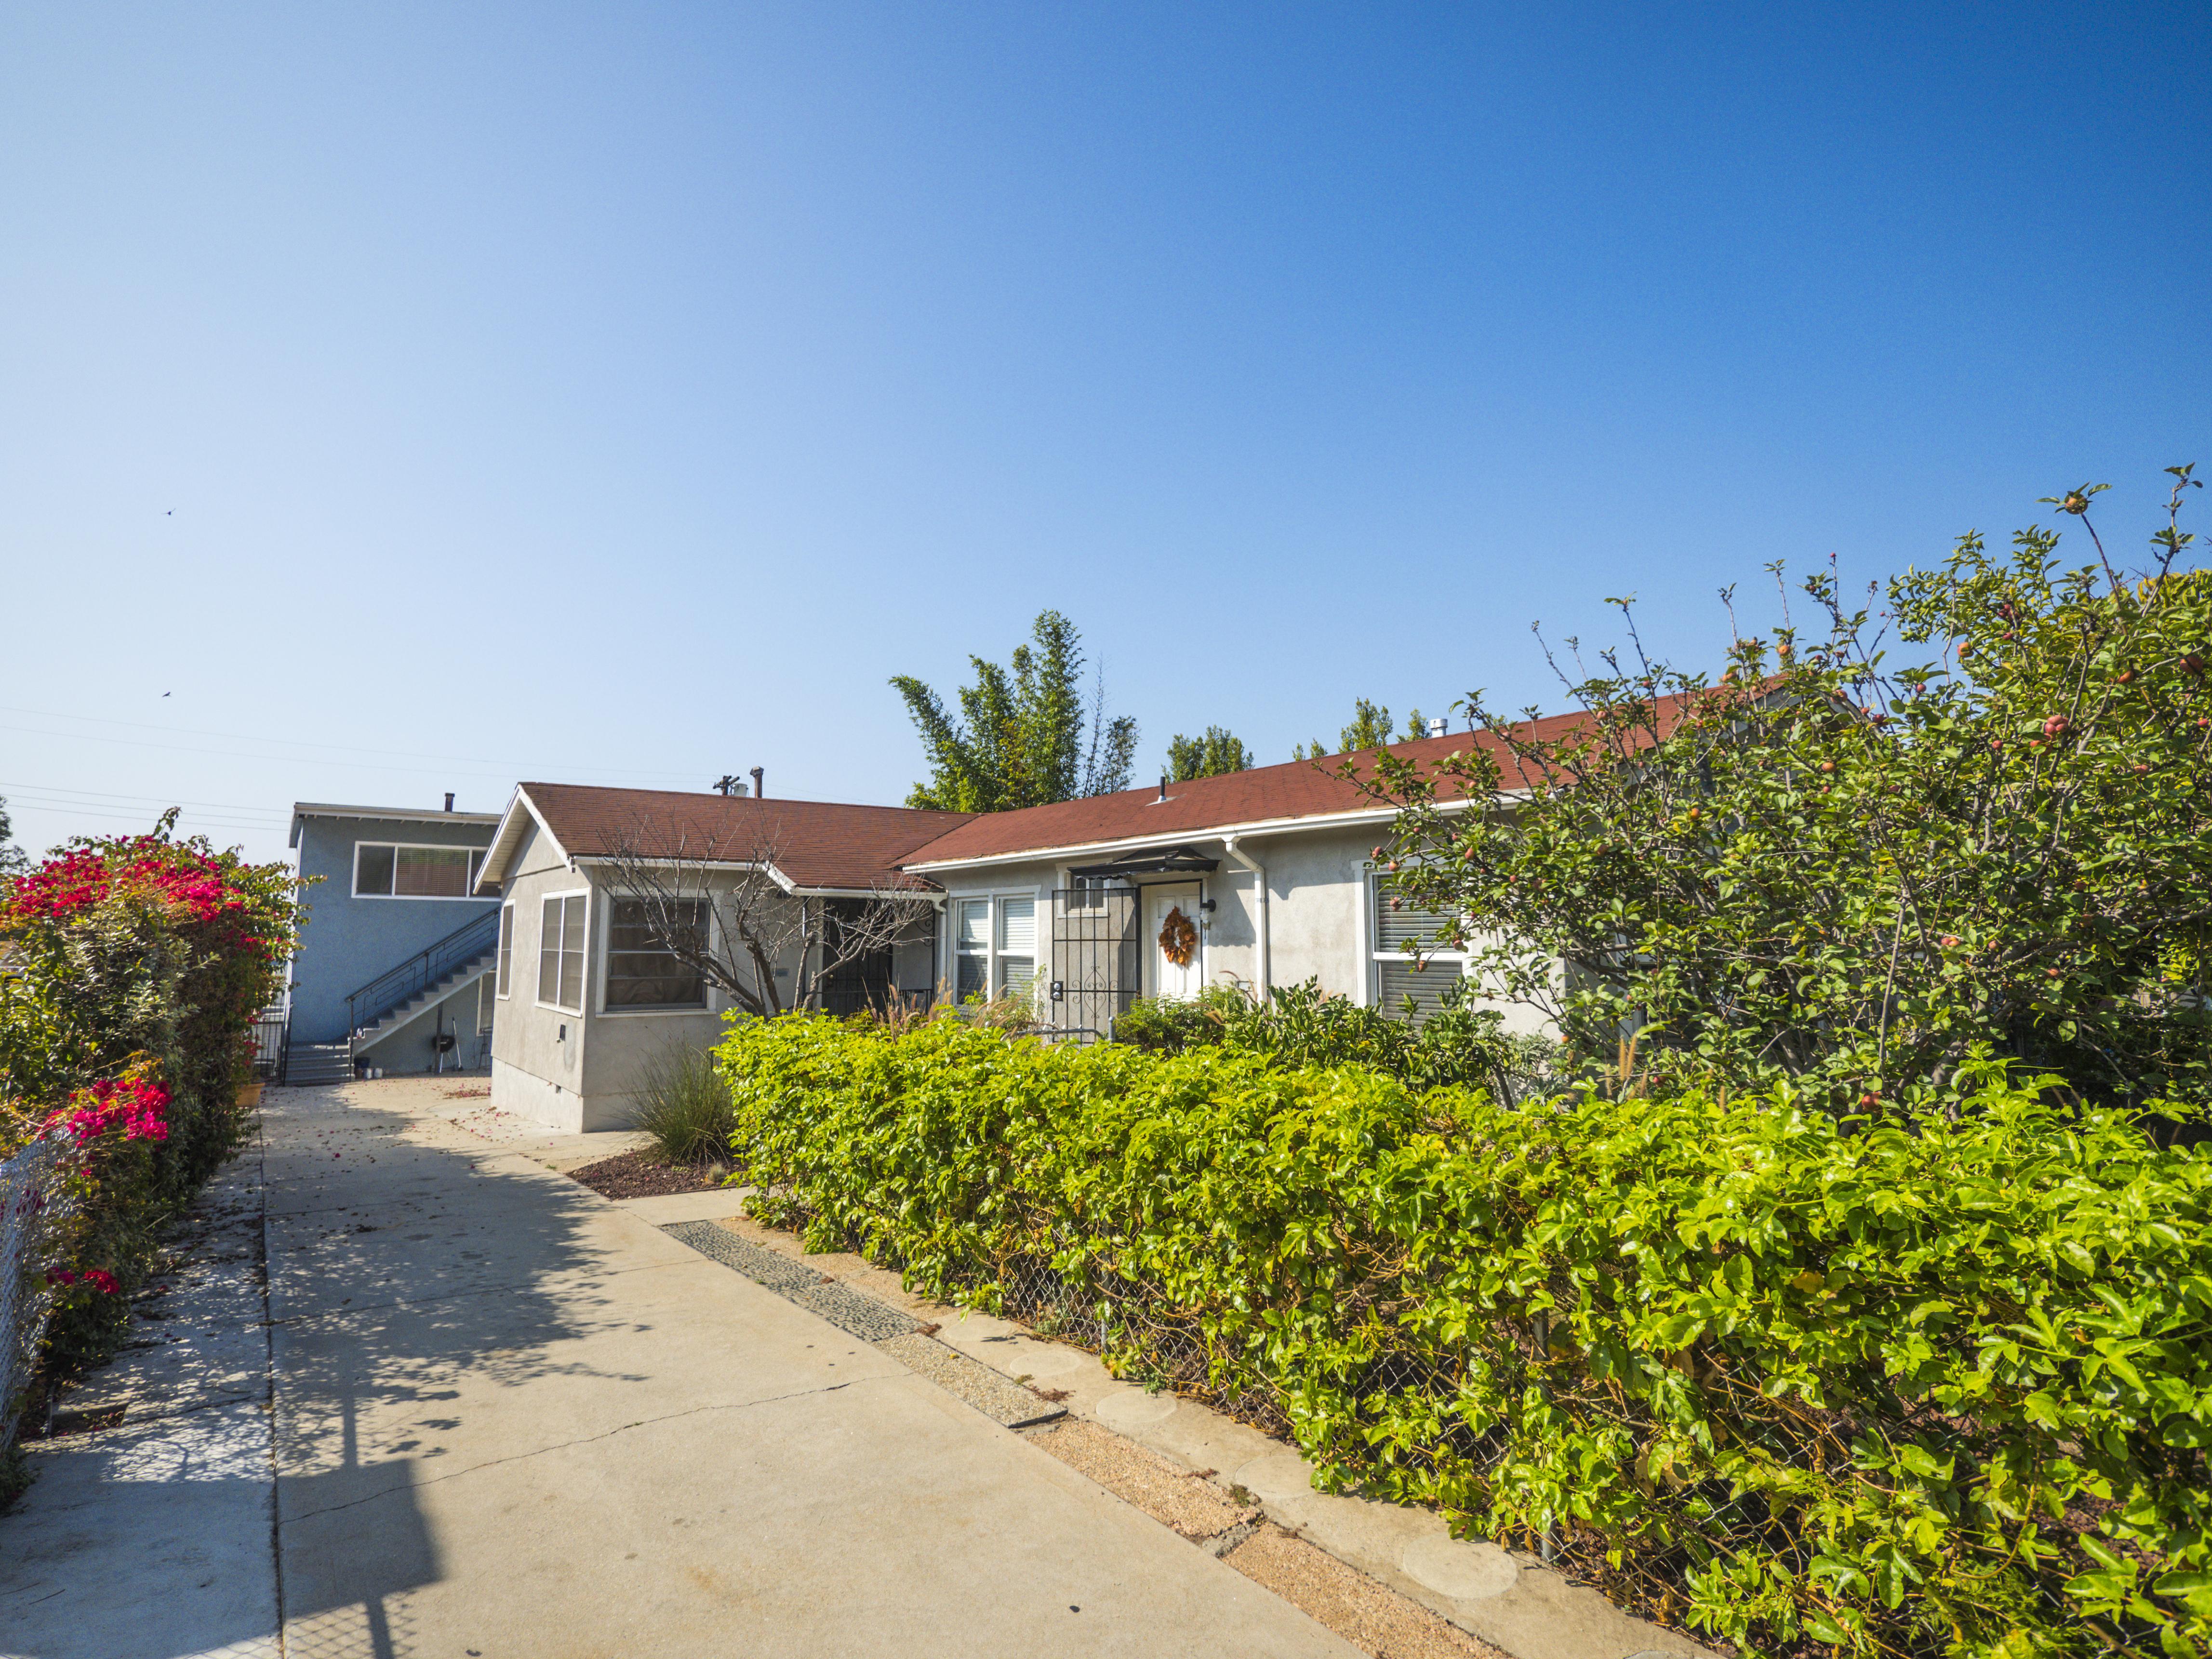 1848 12th St., Santa Monica, CA 90404